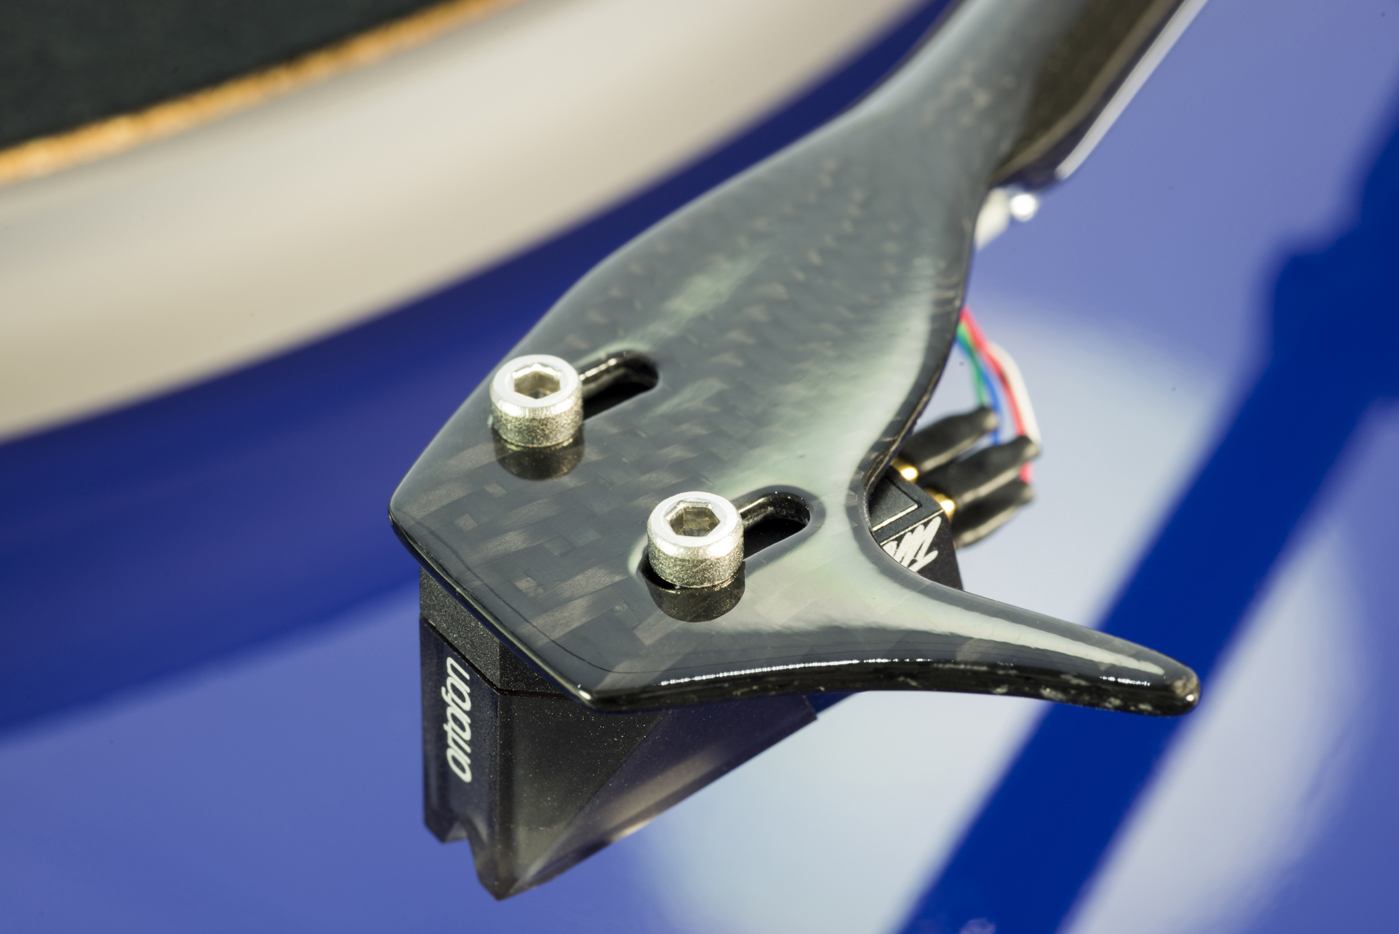 pro-ject-1-xpression-carbon-ukx-ortofon-2M-stylus-in-audio-philia-edinburgh-004.jpg